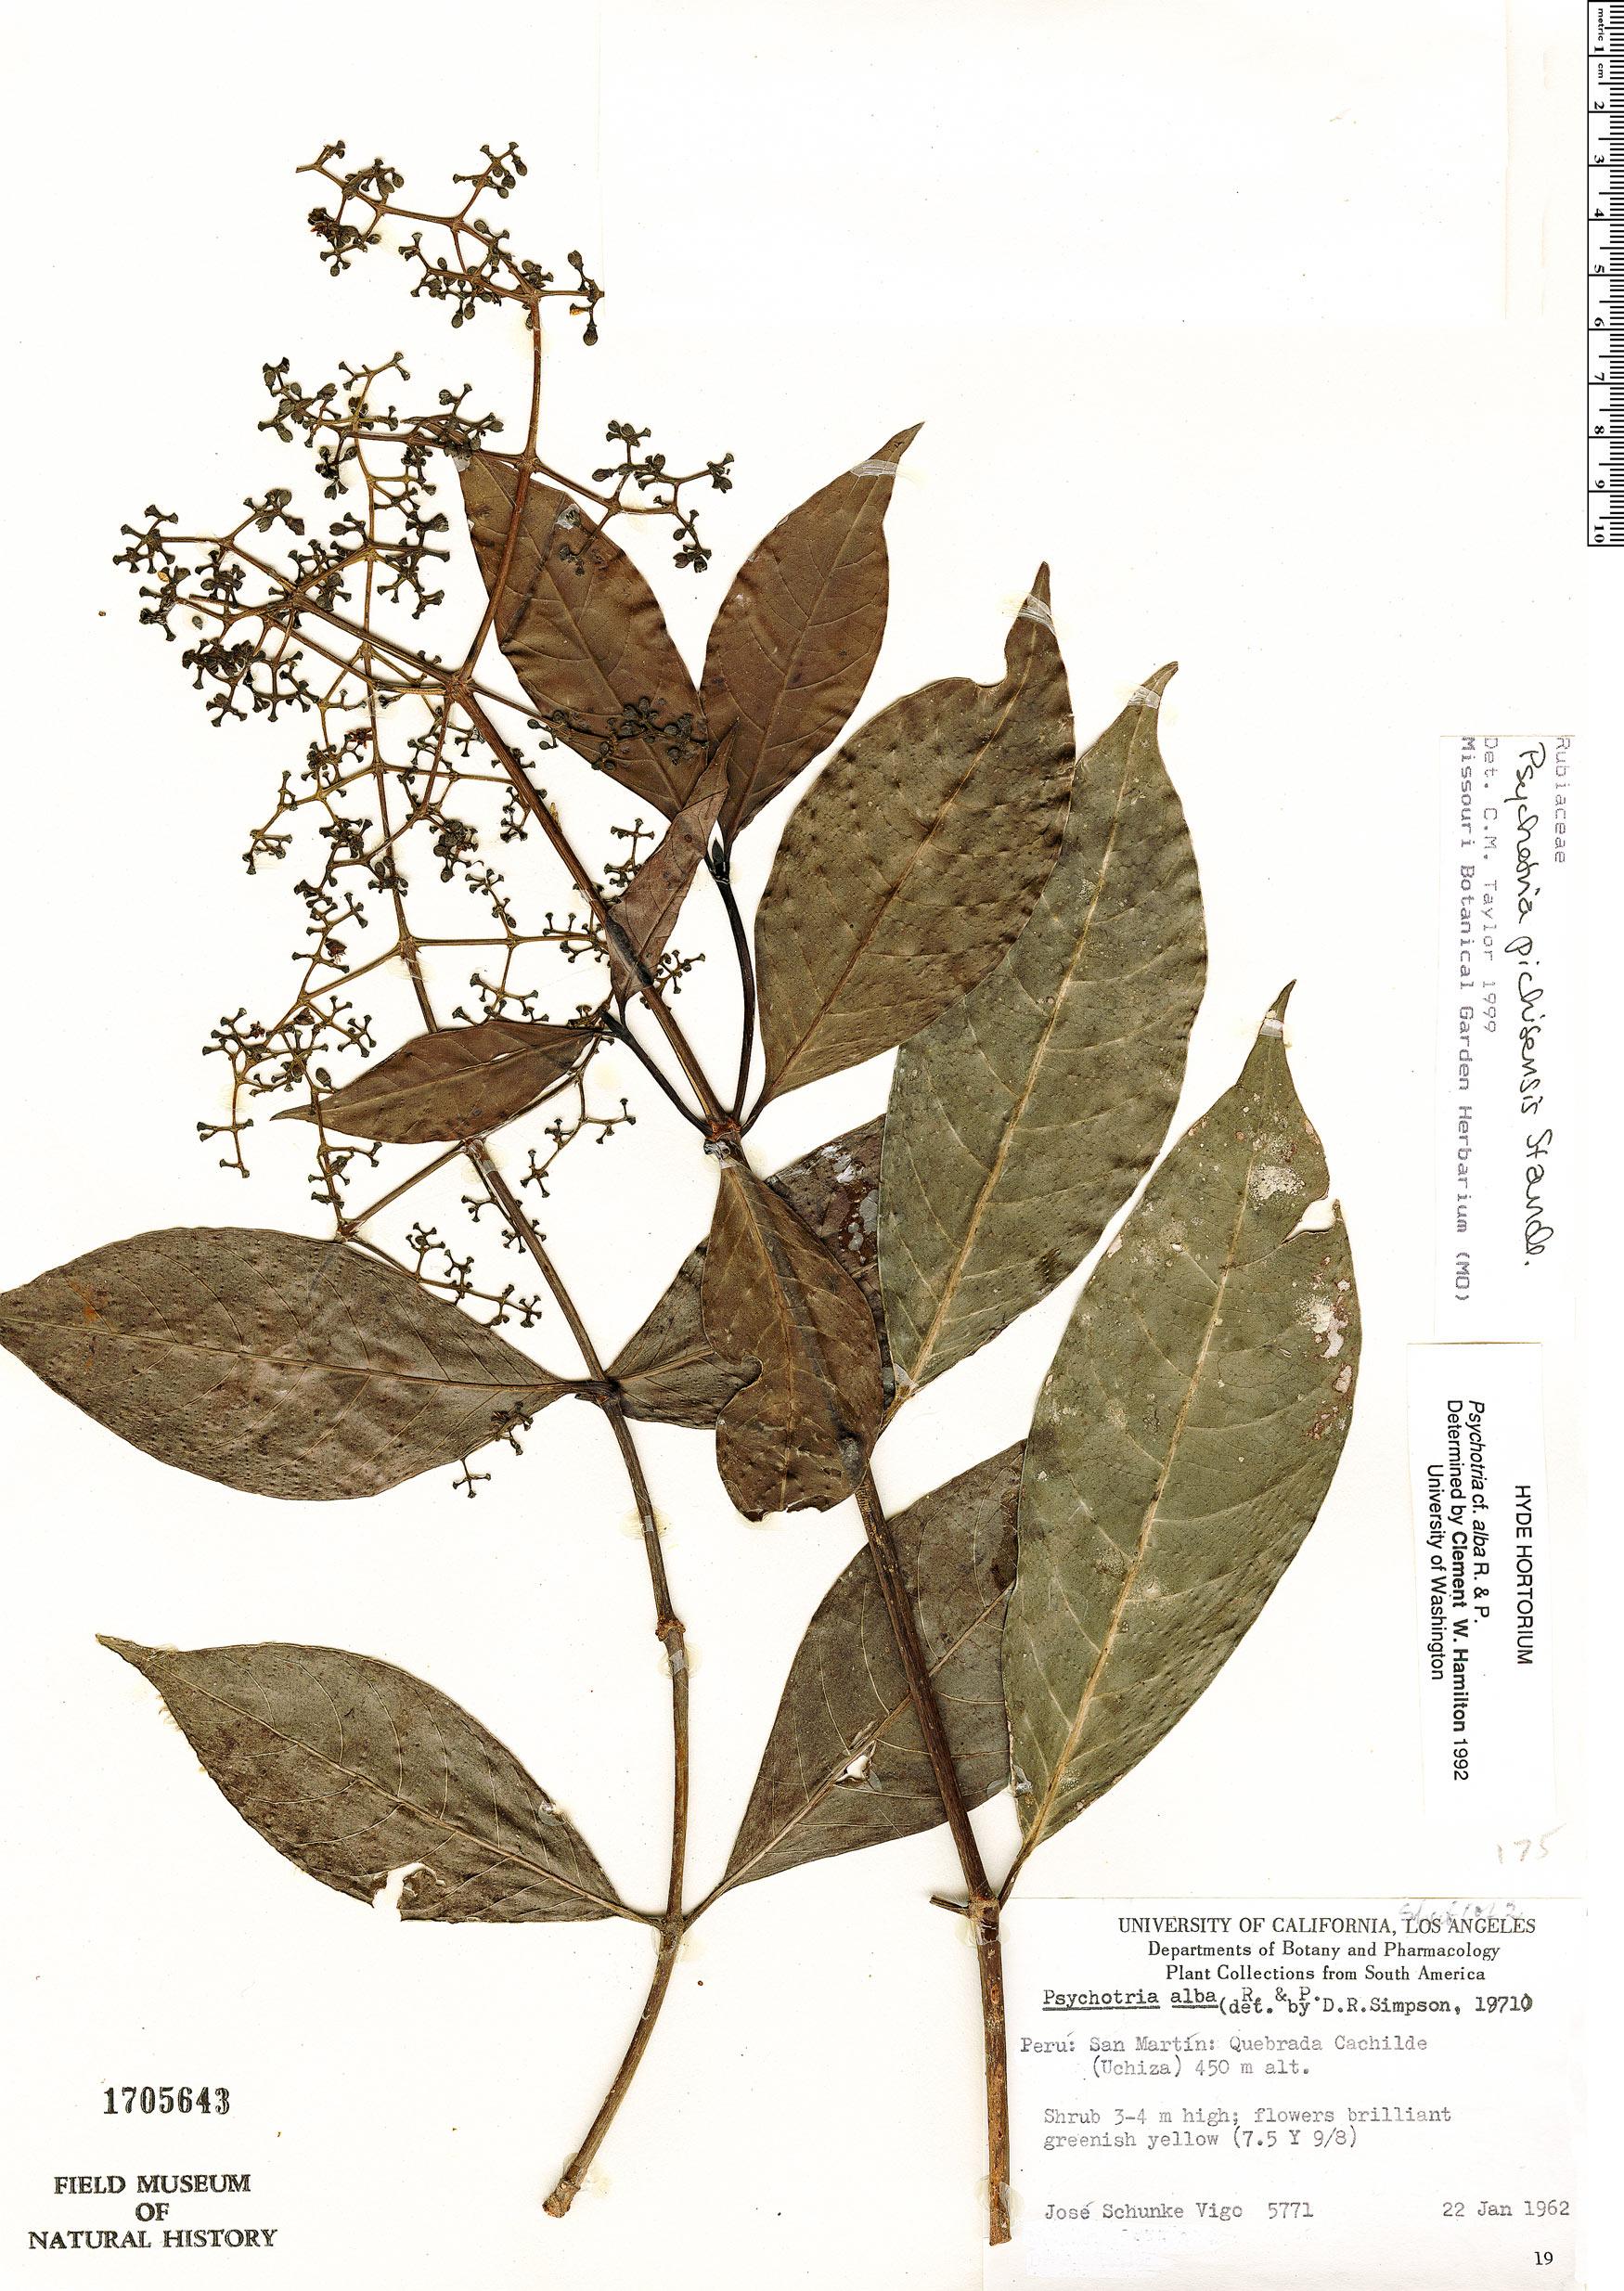 Specimen: Psychotria pichisensis